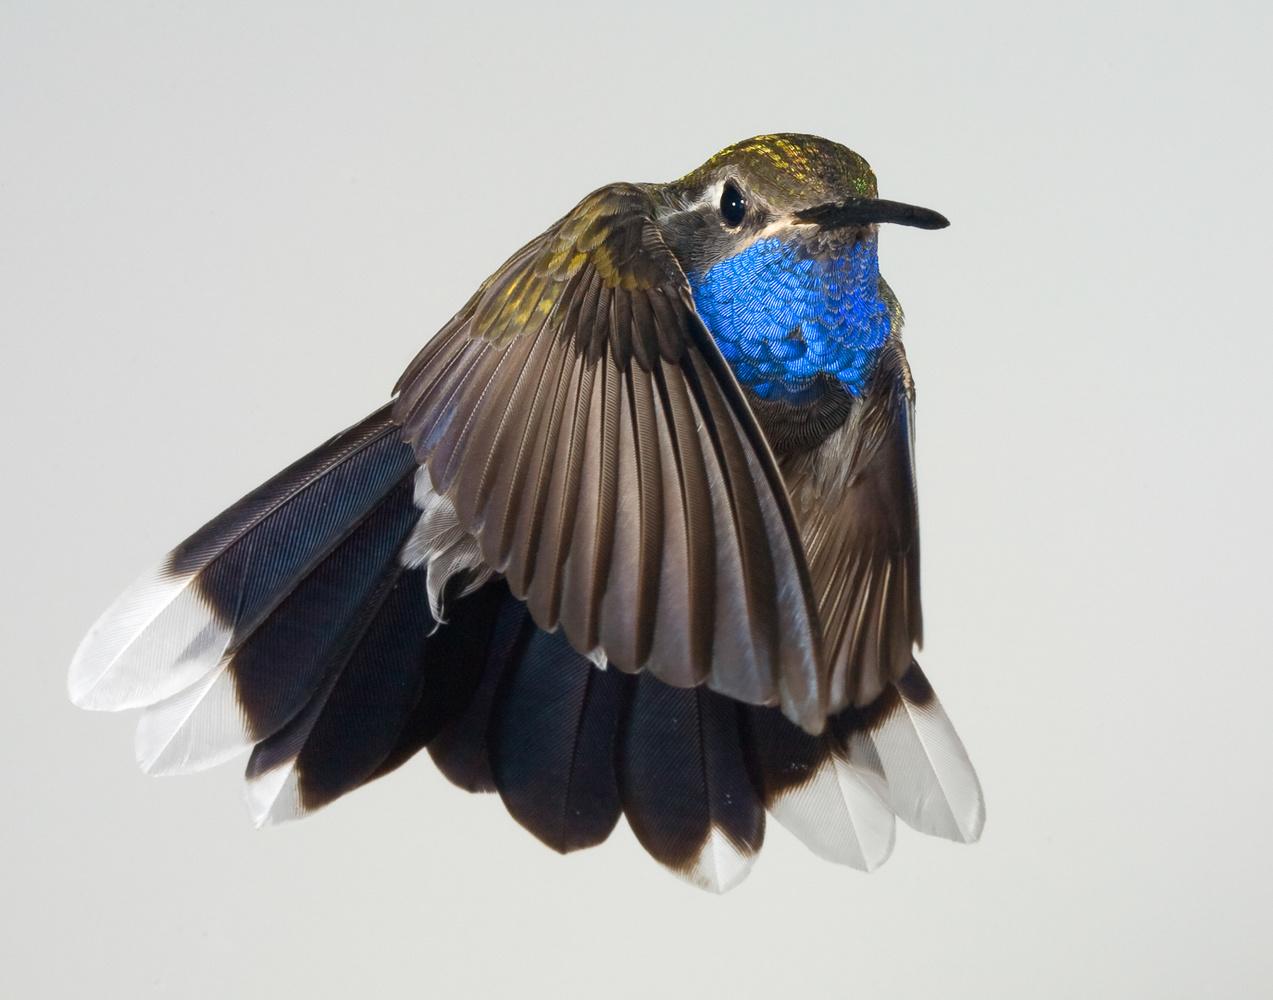 Blue Throated Hummingbird as Ballet Dance in Tutu by Gregory Scott